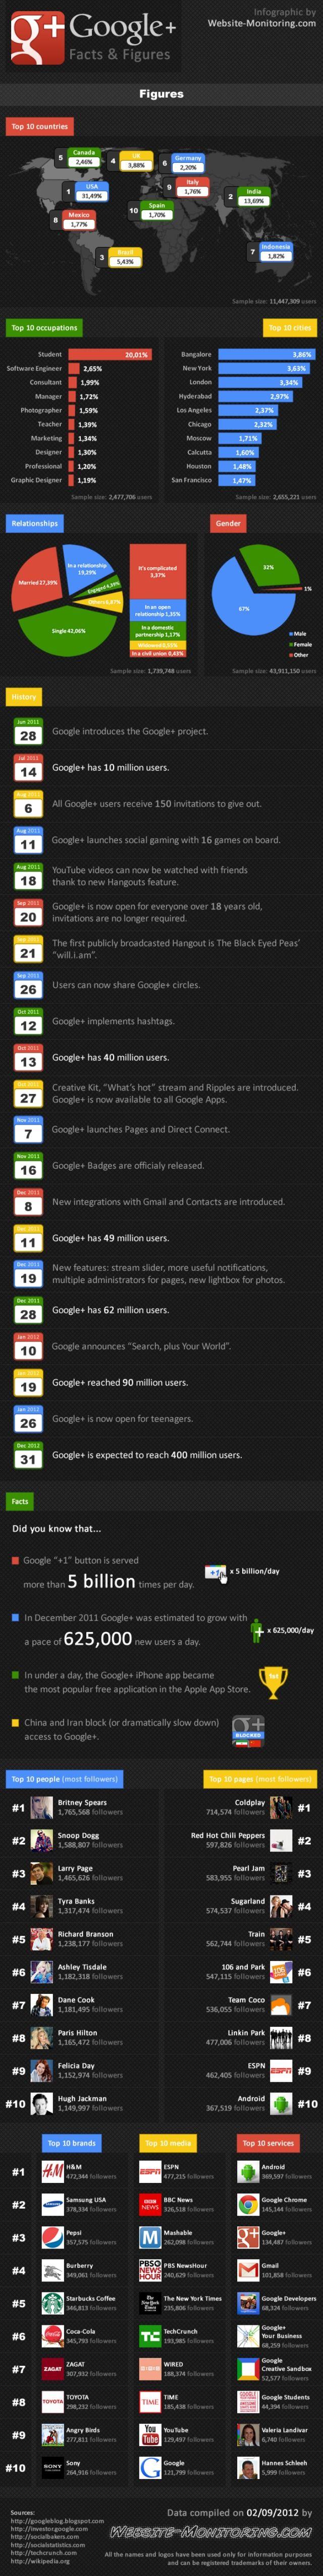 Google Facts & Figures